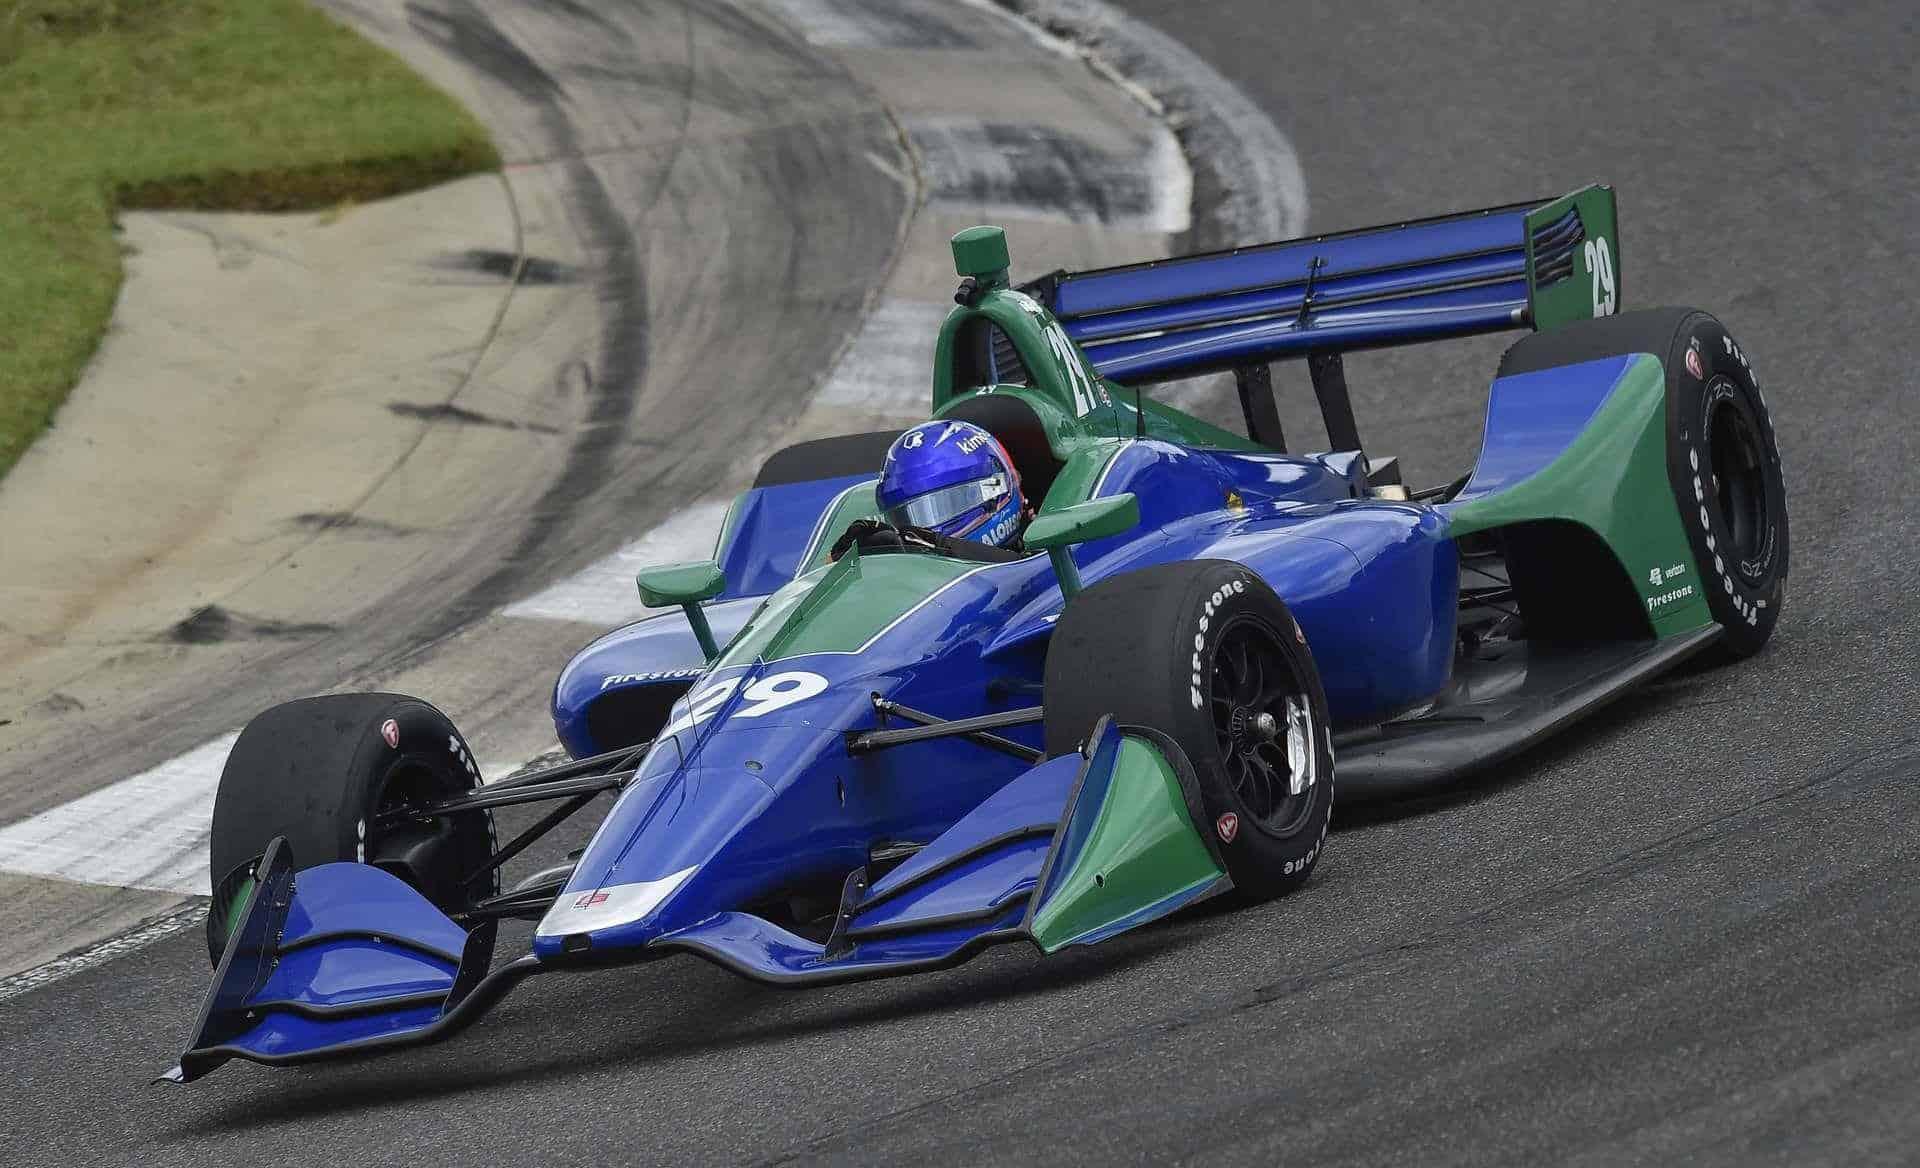 Alonso Indycar 2018 test Barber on the track Photo IndyCar